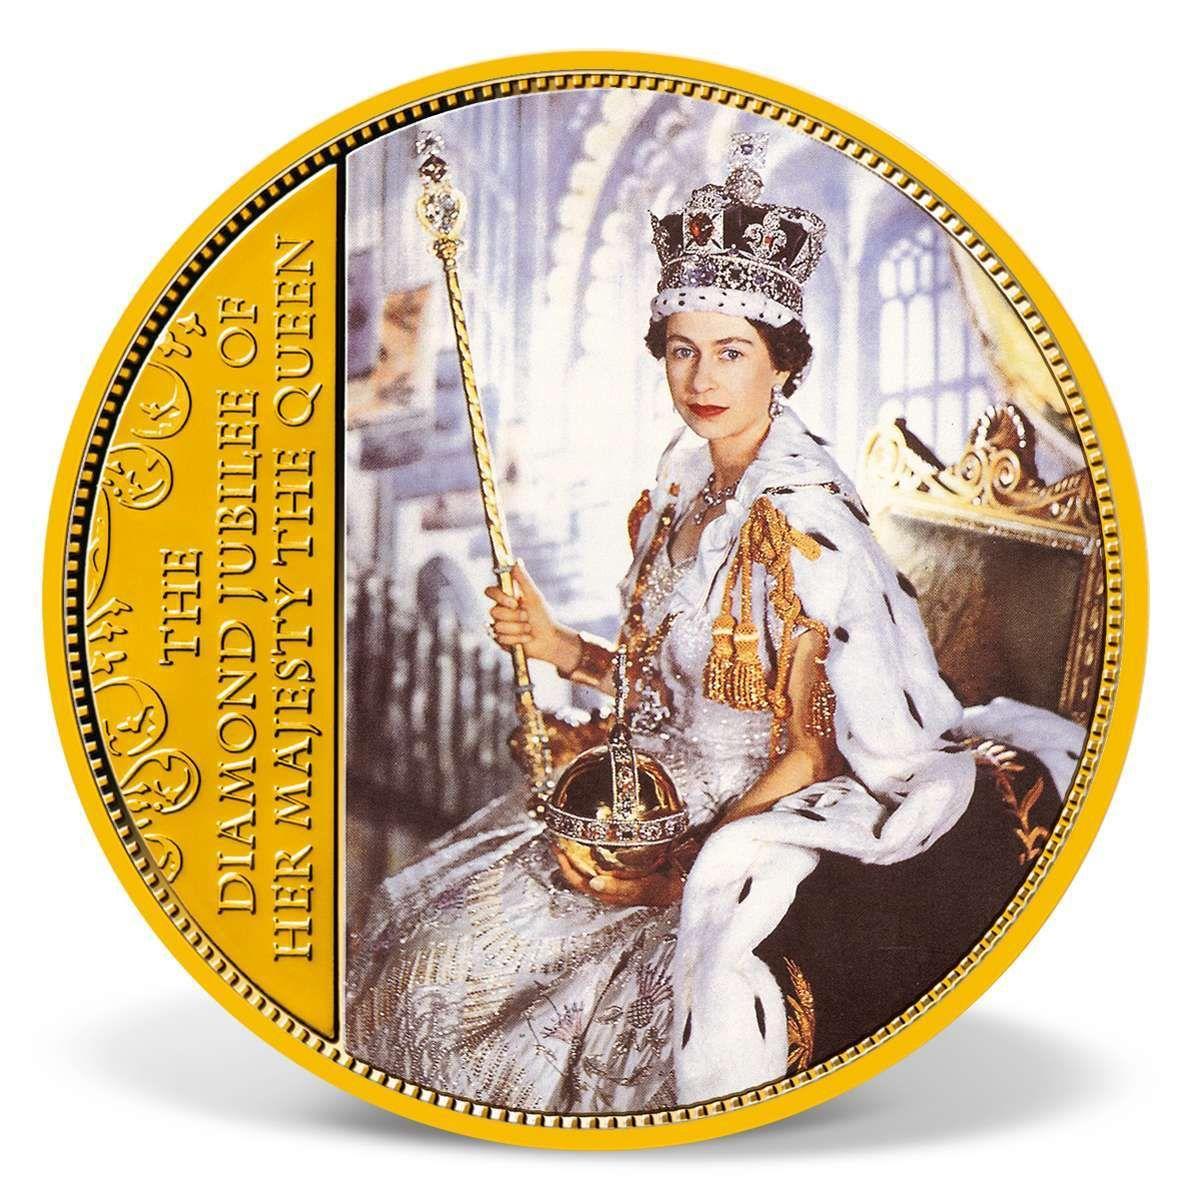 Queen Elizabeth II Diamond Jubilee Colossal Commemorative